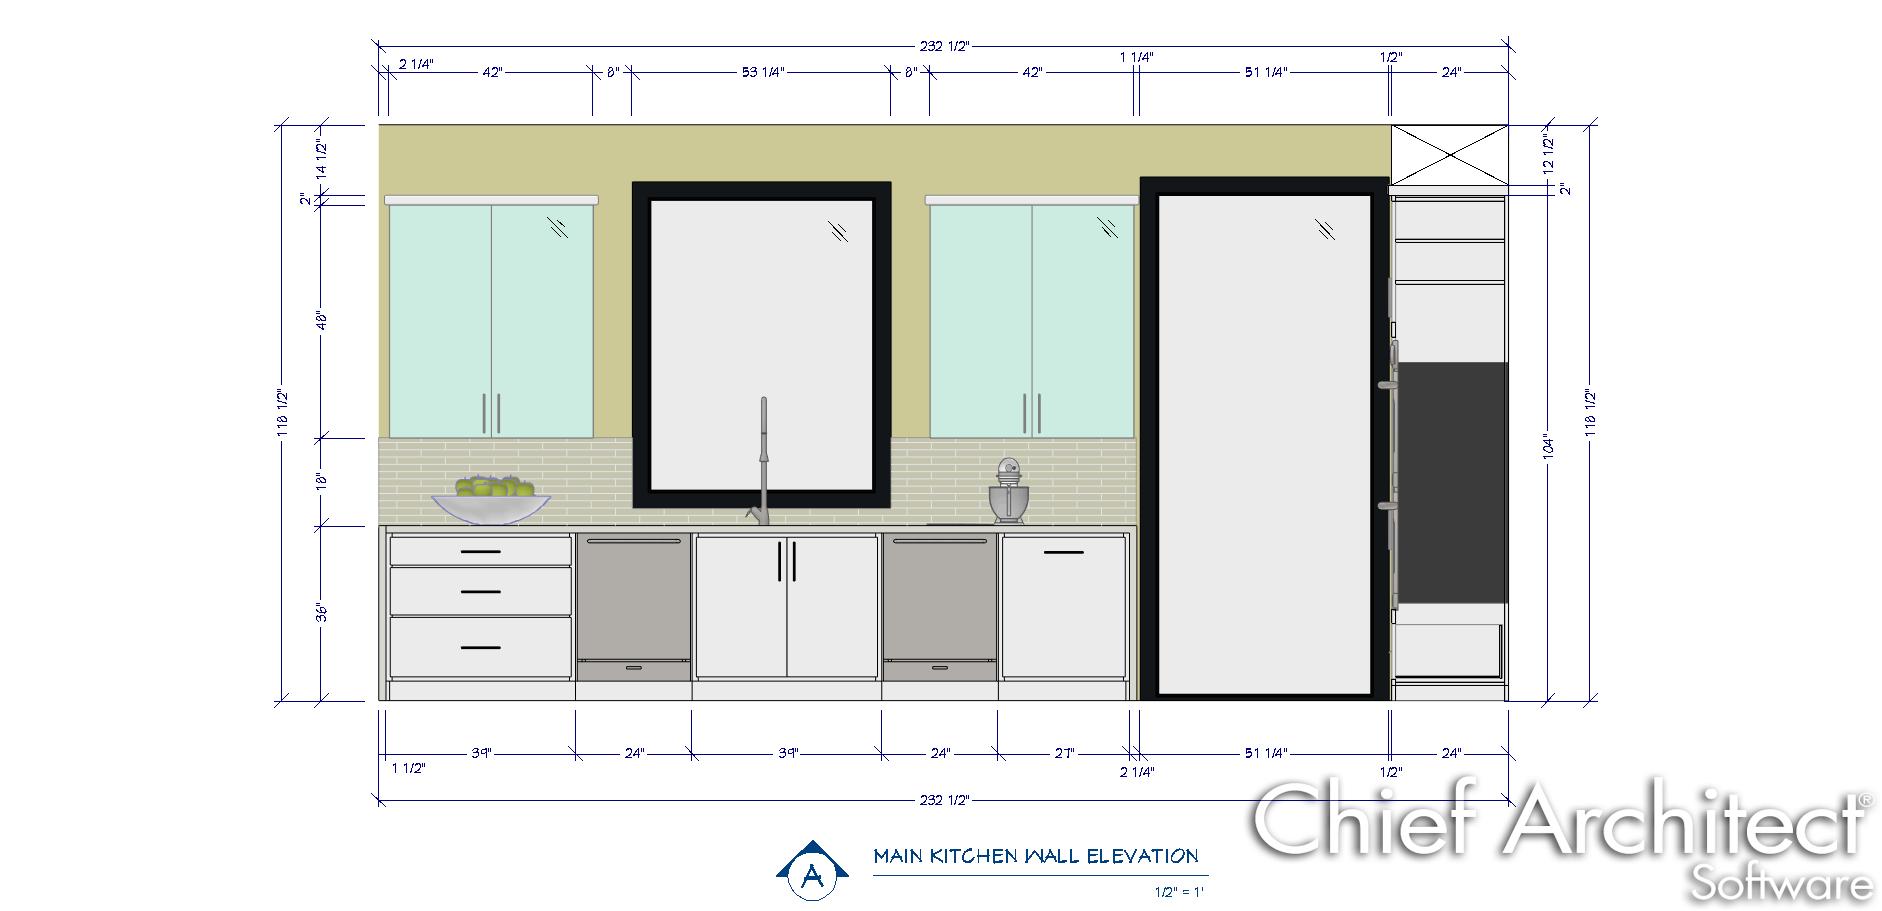 Home designer architectural 2016 pc software computer for Home designer architectural 2016 help